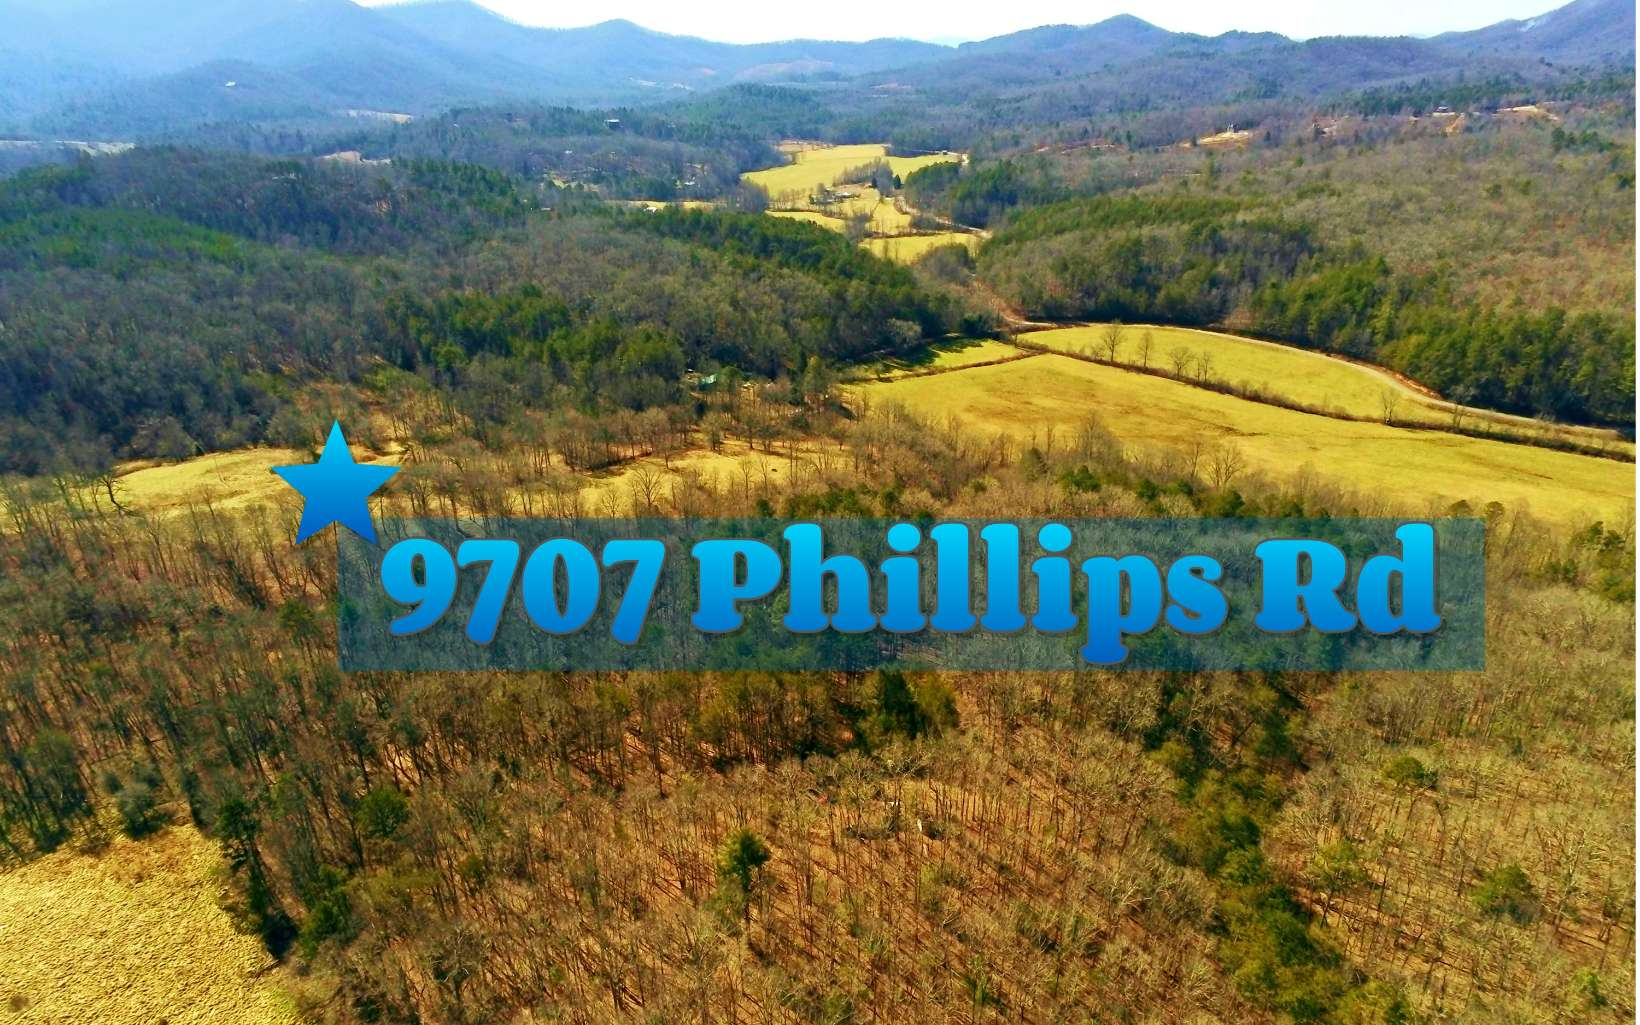 9707  PHILLIPS ROAD